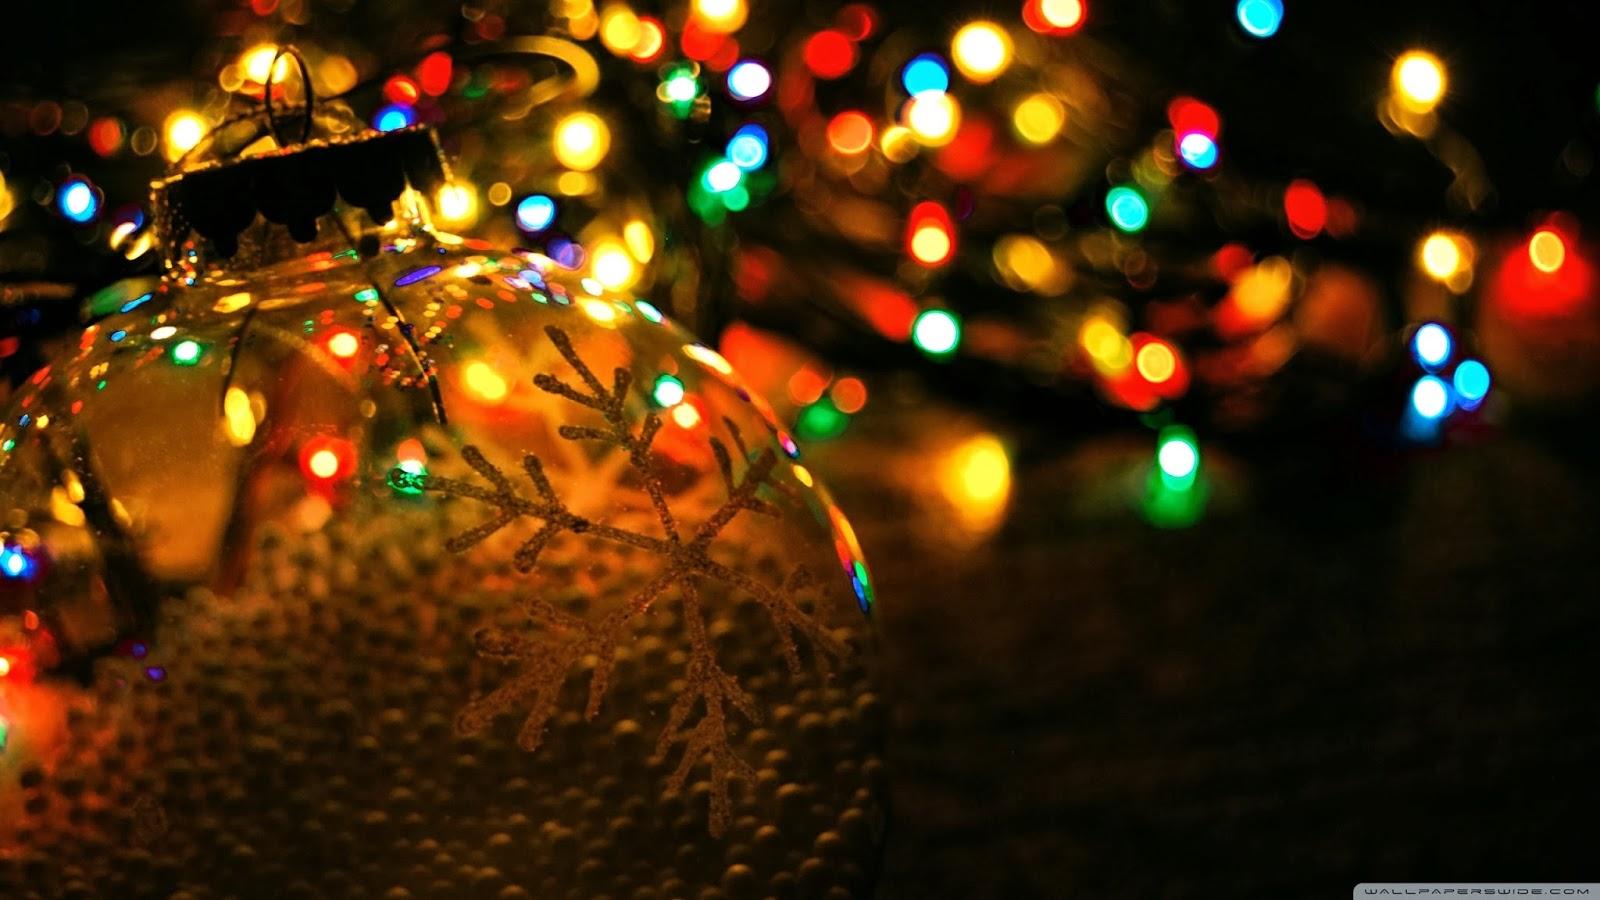 CGfrog: 50 Elegant HD Wallpapers Of Christmas For Mobile